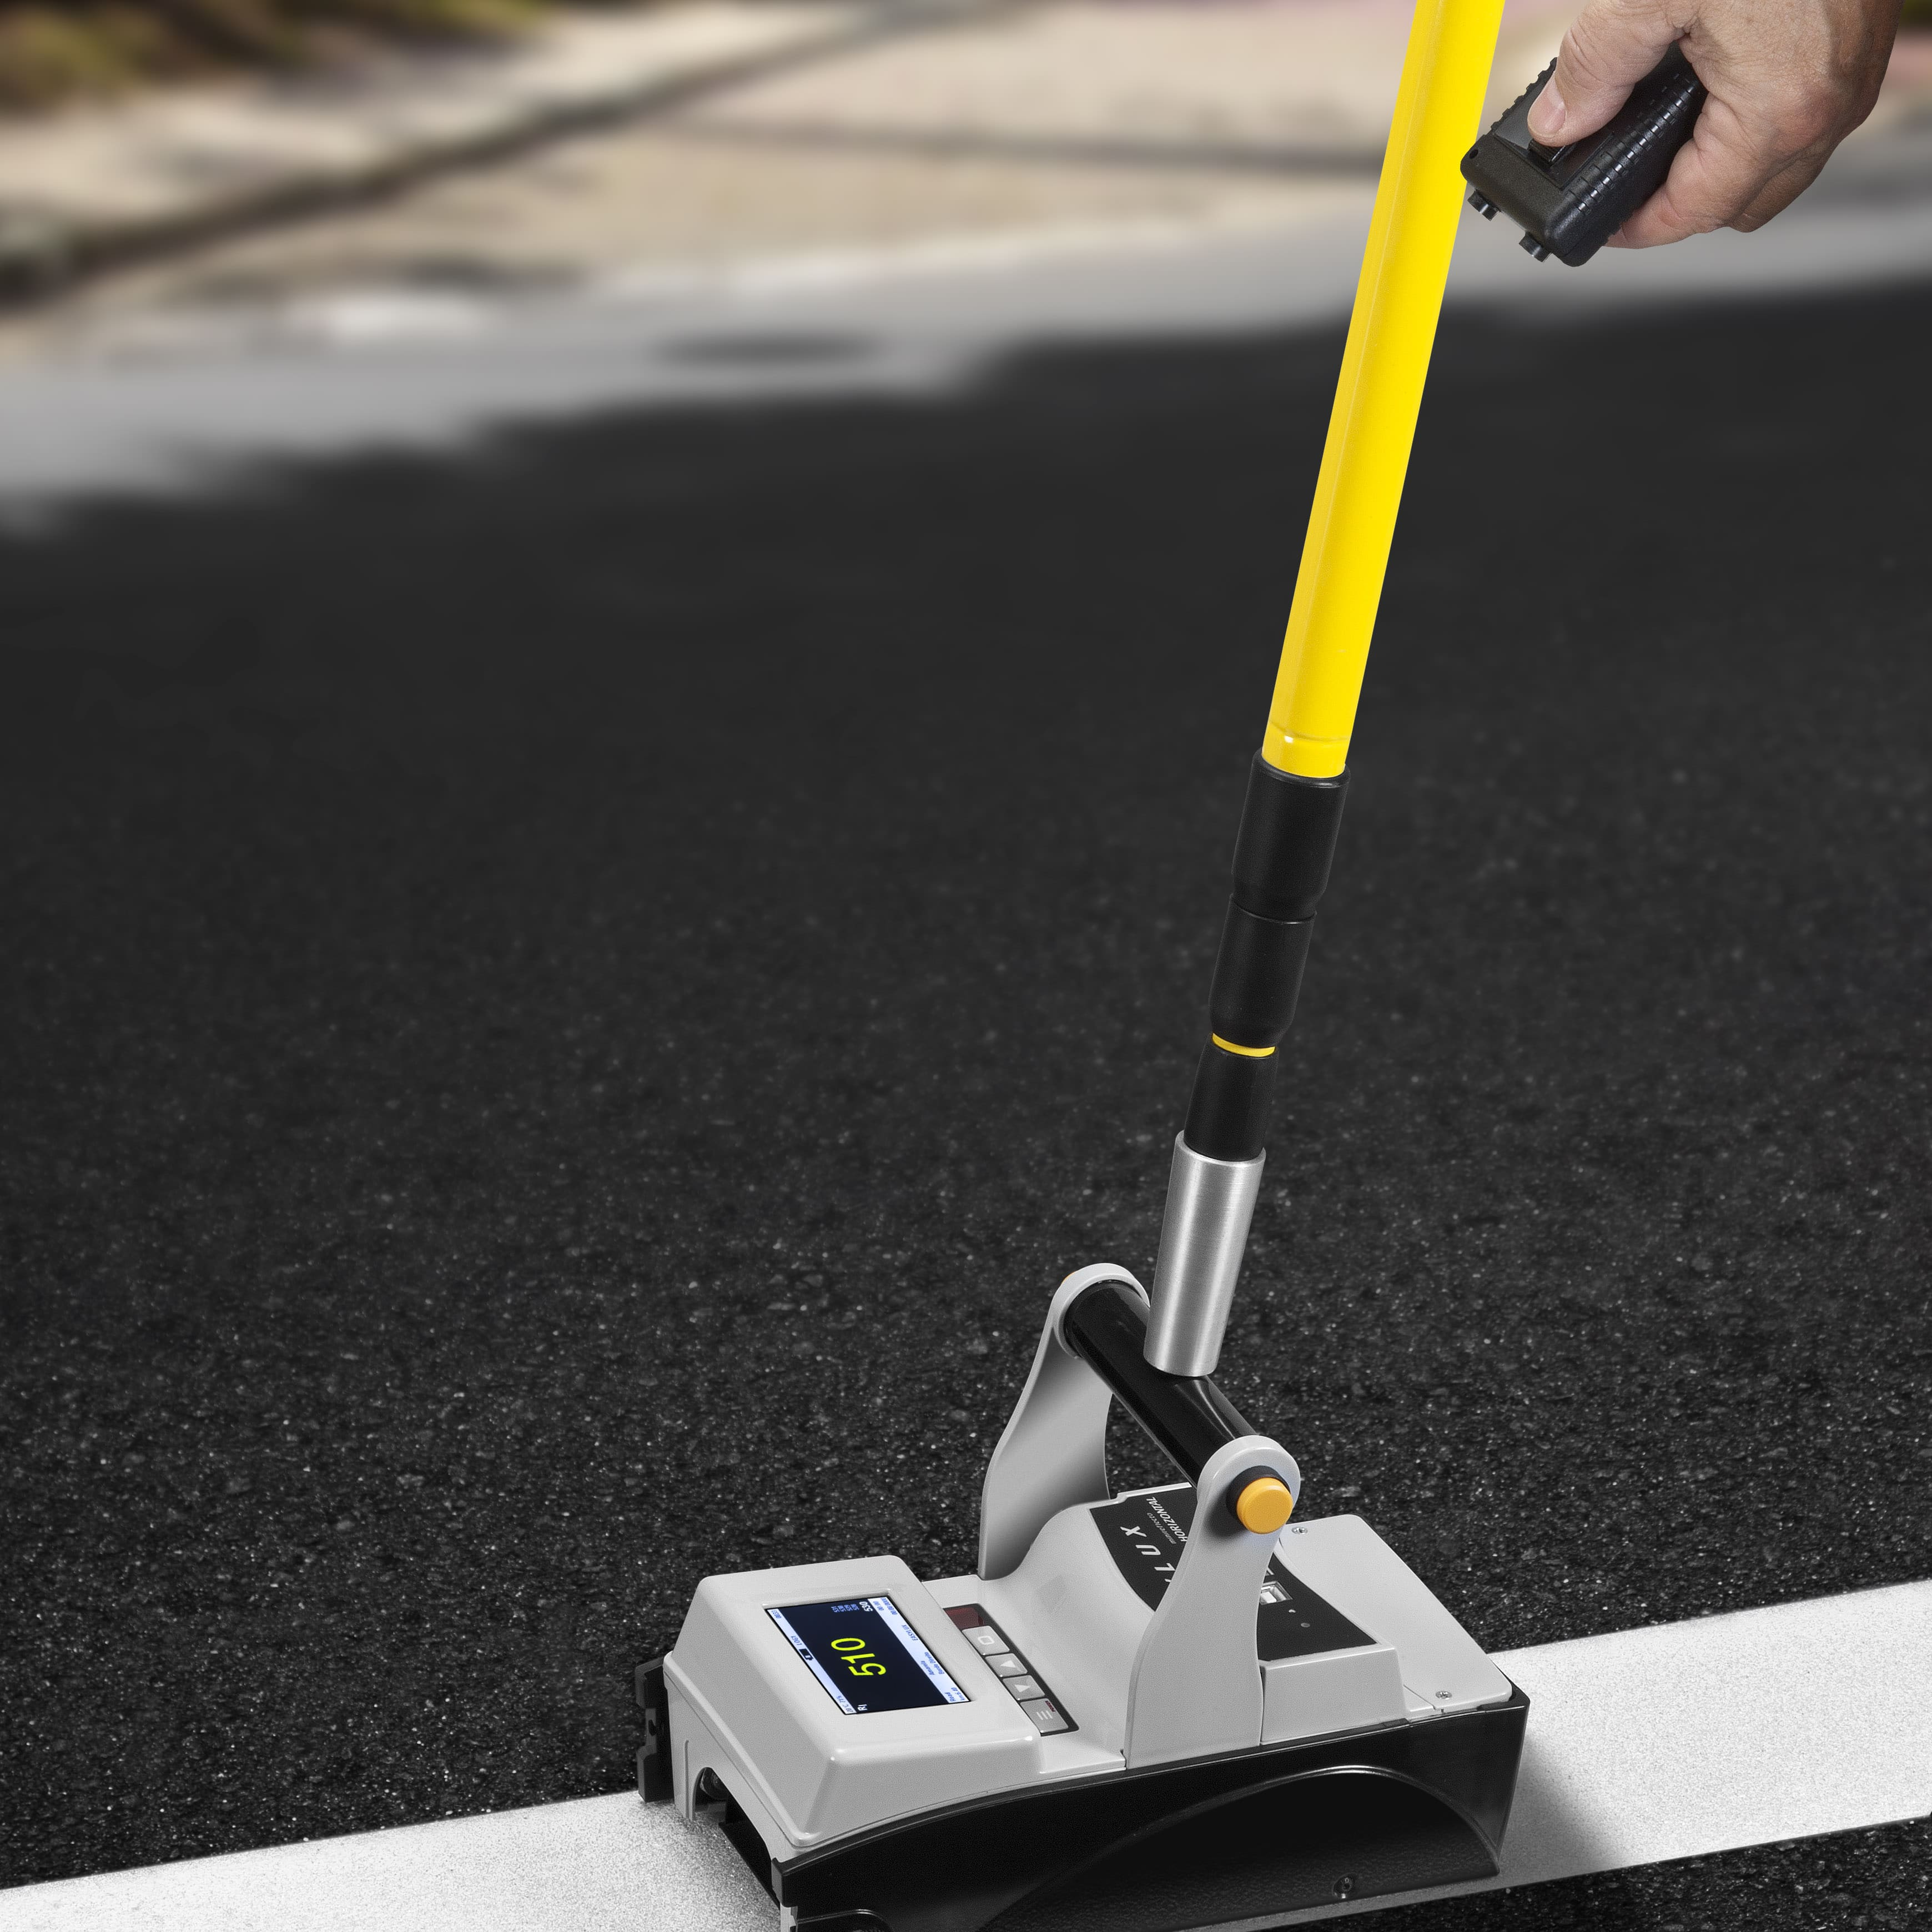 retroreflectometer - Easylux - ASTM E1710 / EN 1436 / for road markings